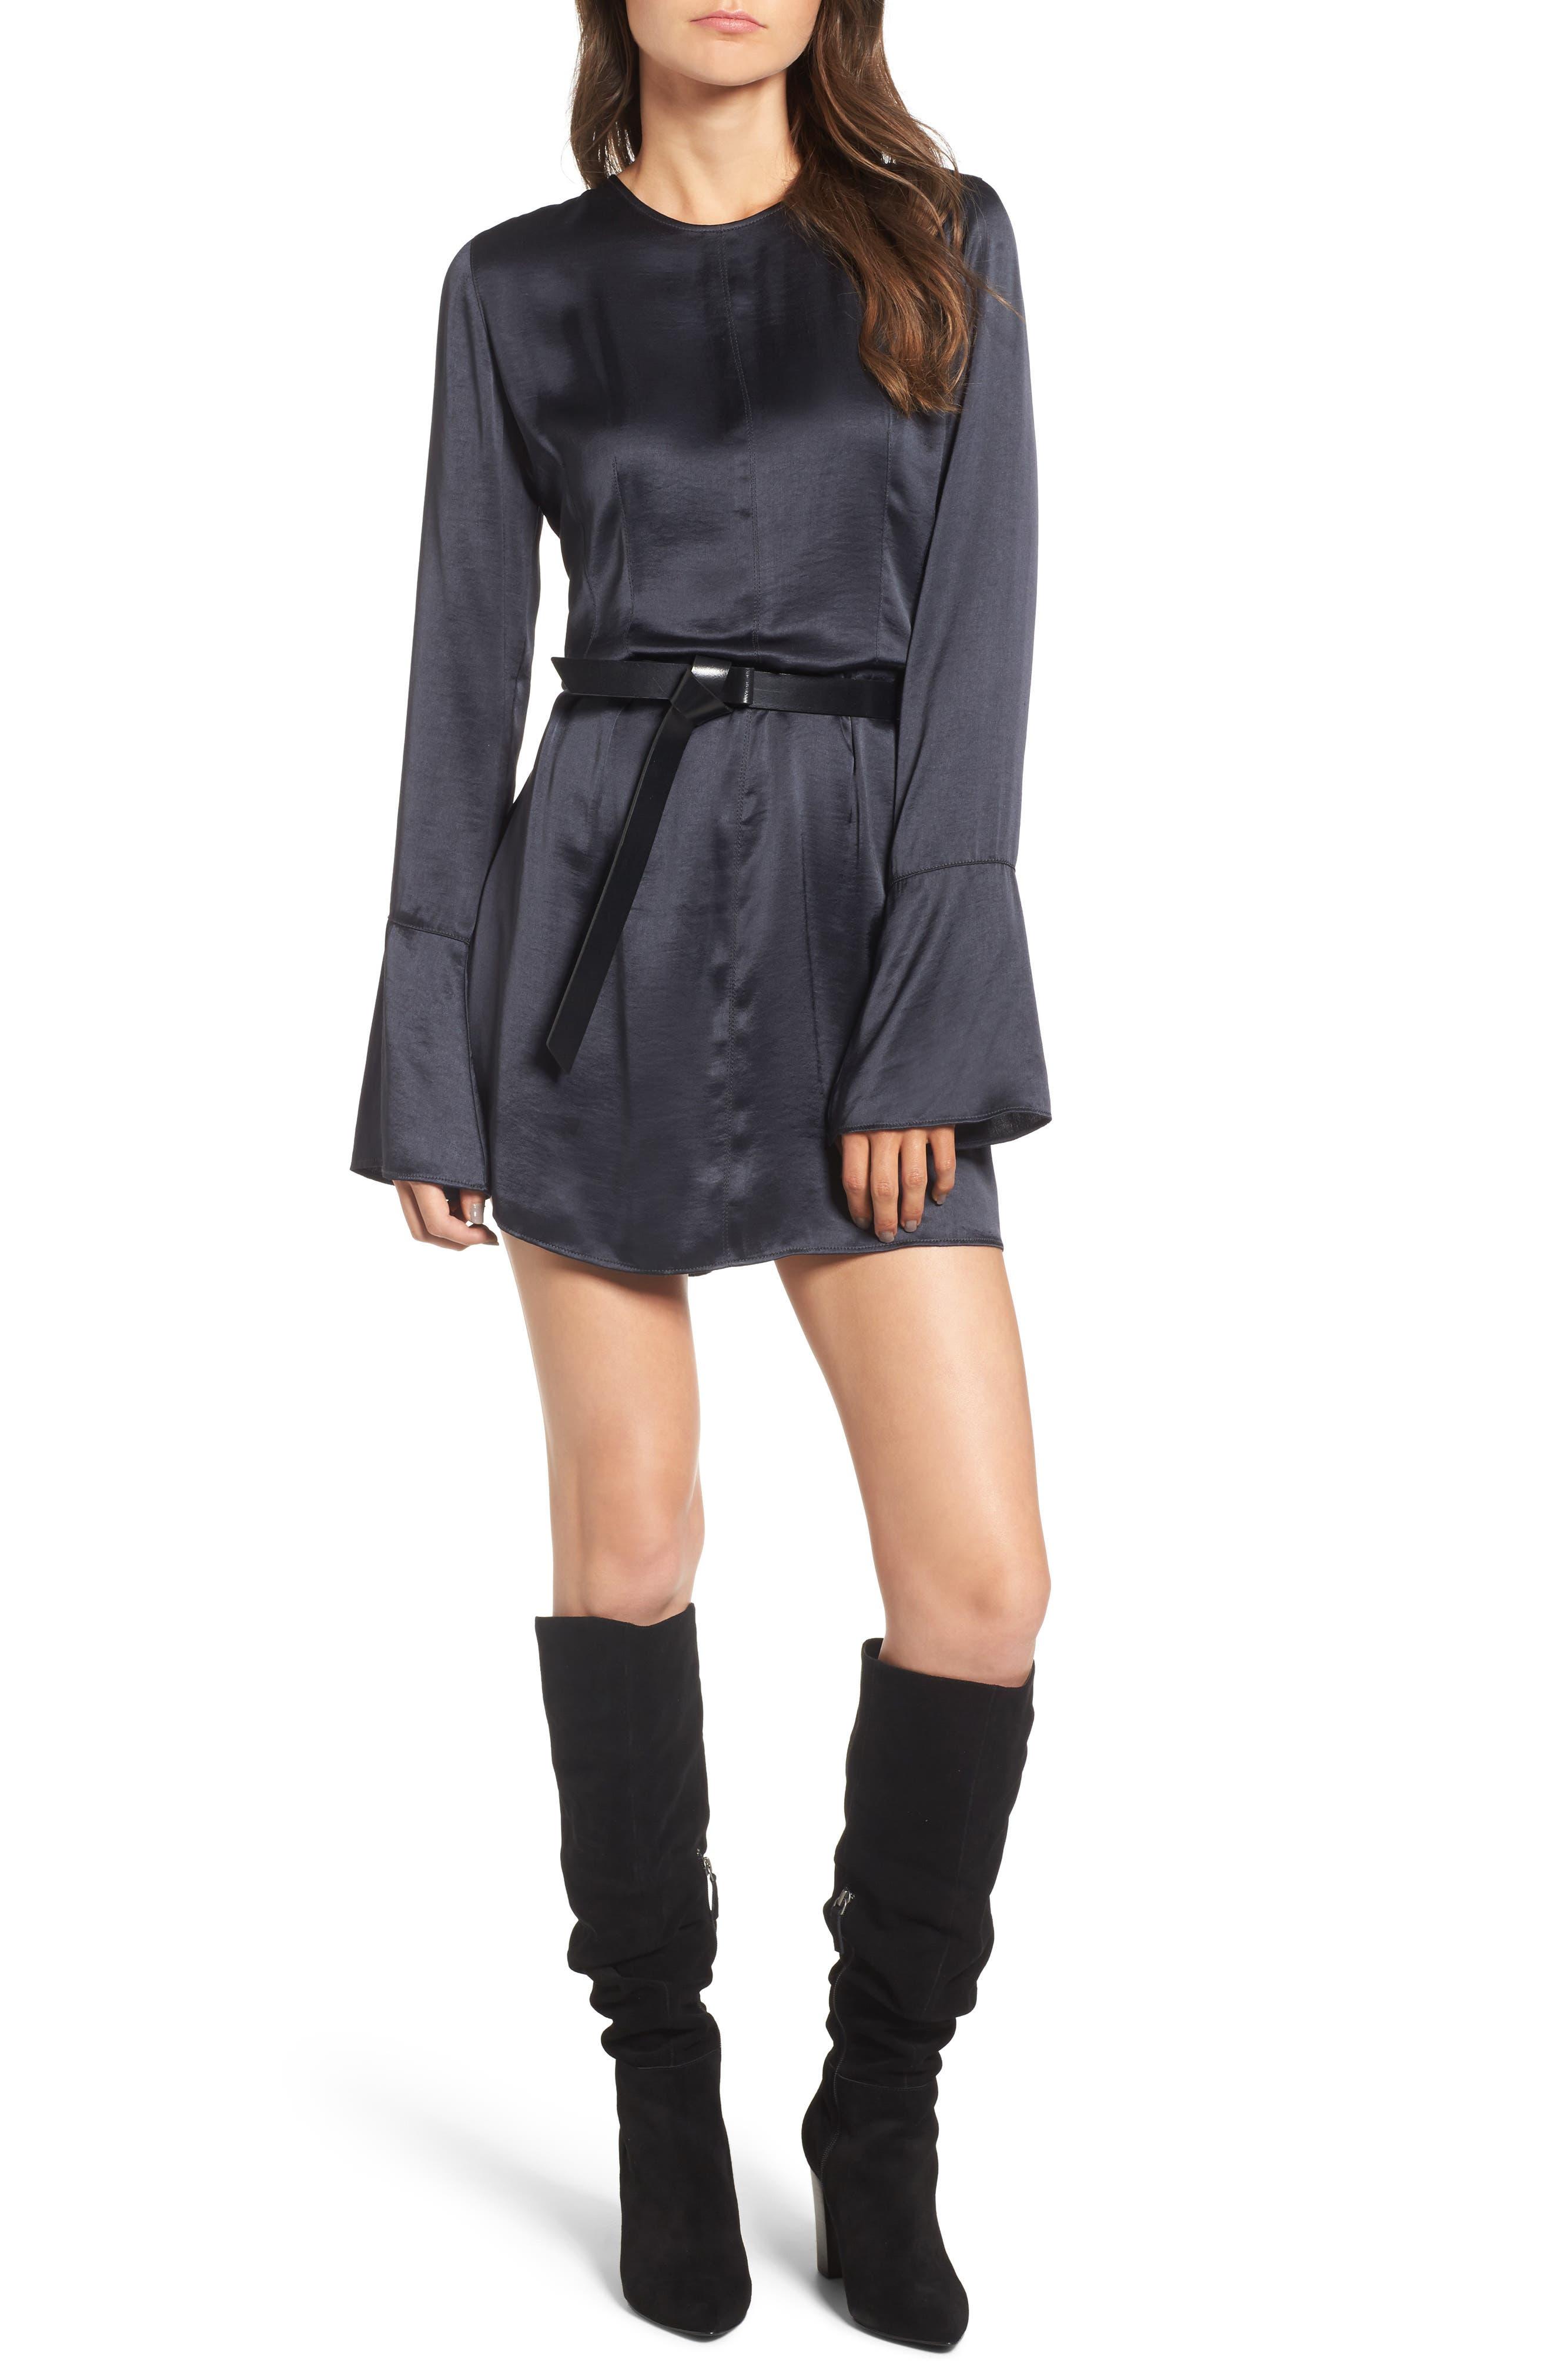 x Something Navy Bell Sleeve Minidress,                             Main thumbnail 1, color,                             Grey Phantom